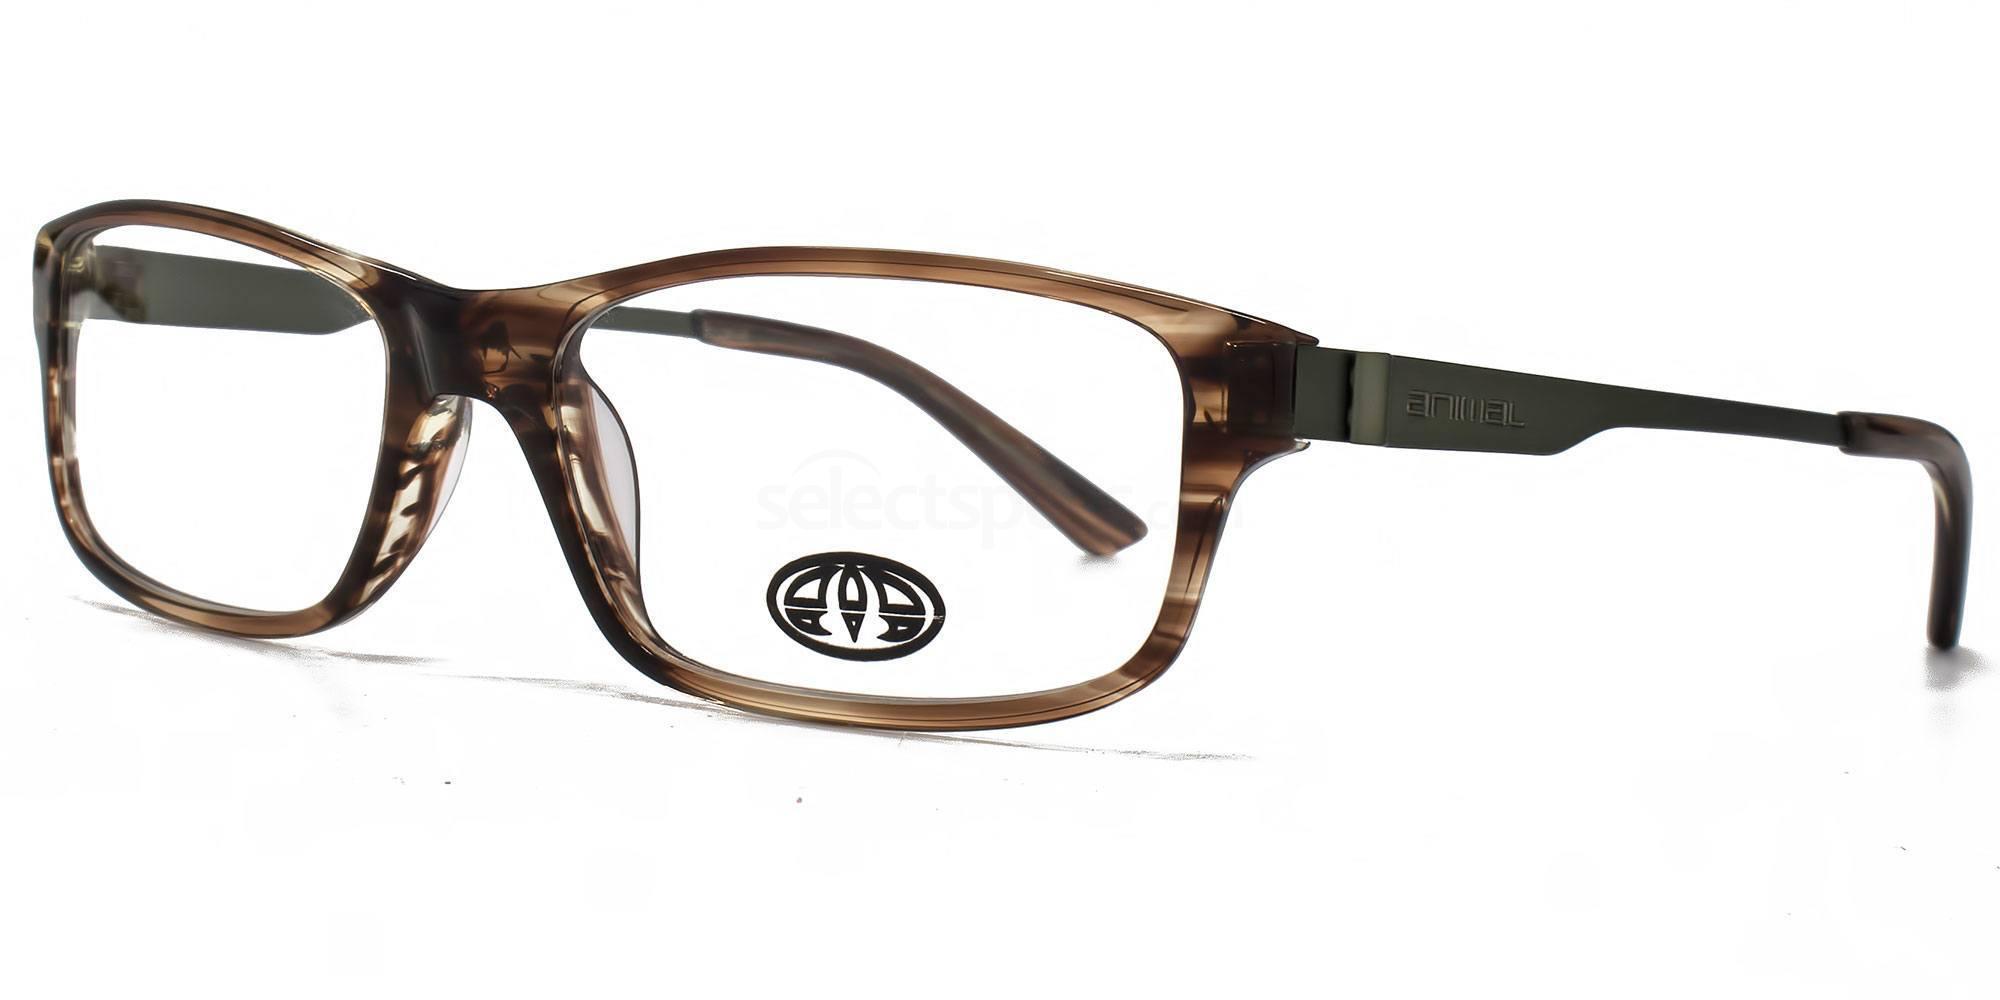 BRN ANIS003 - STOKES Glasses, Animal